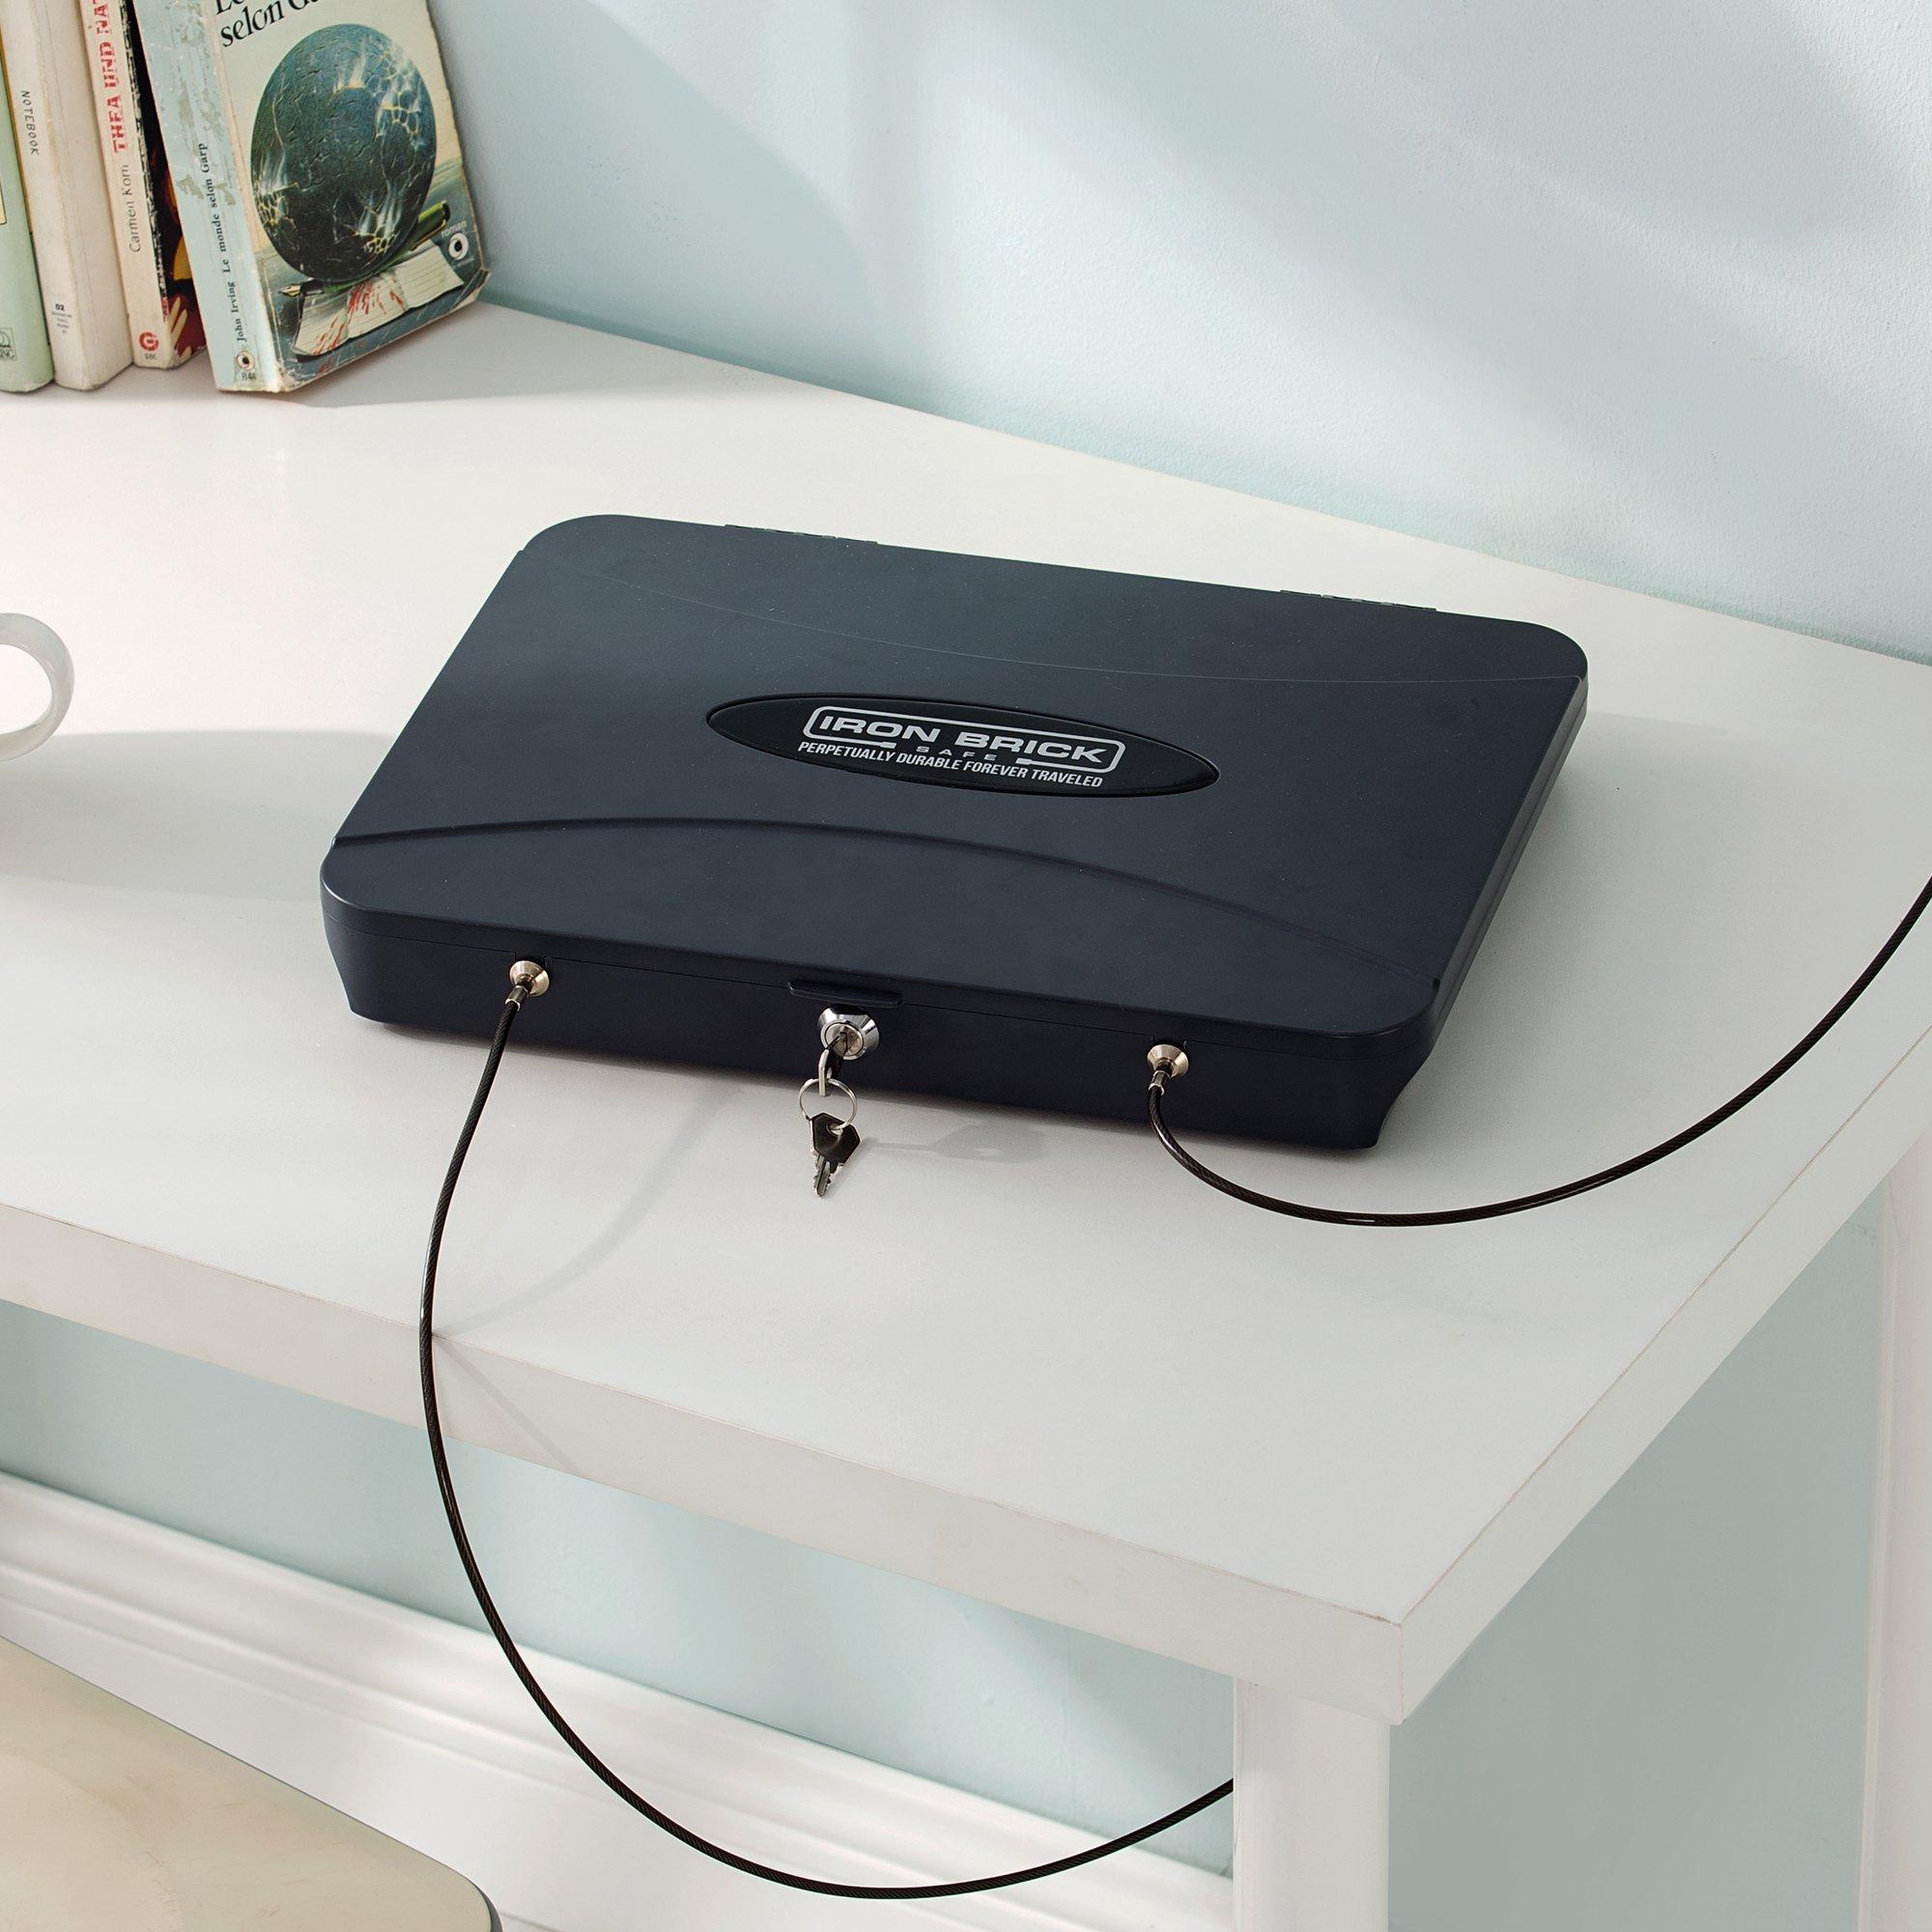 Iron Brick Safe - Portable Laptop/Tablet Safe by DormCo